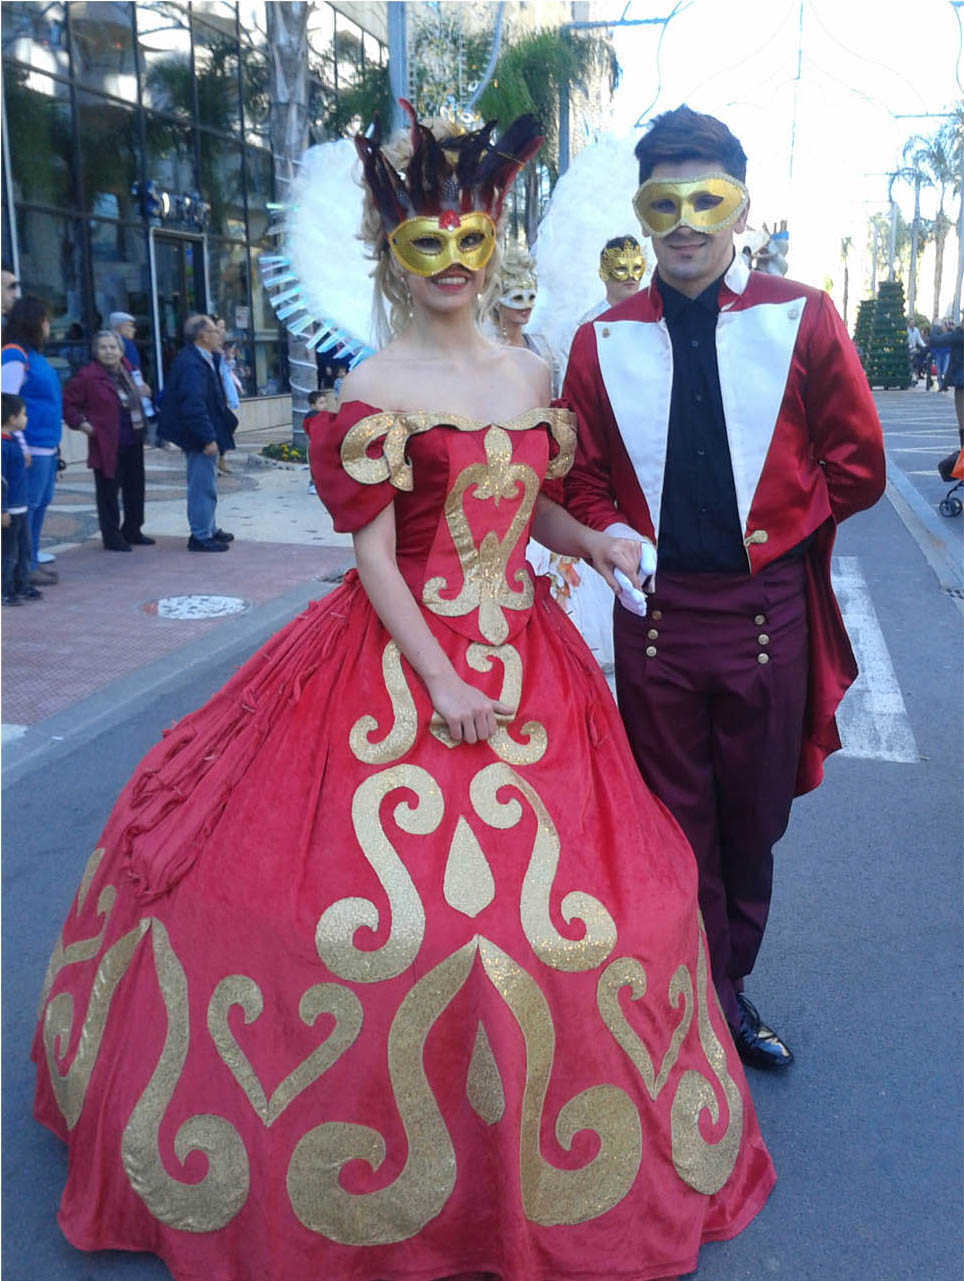 Oropesa - La Saint Valentin et carnaval marina d'or